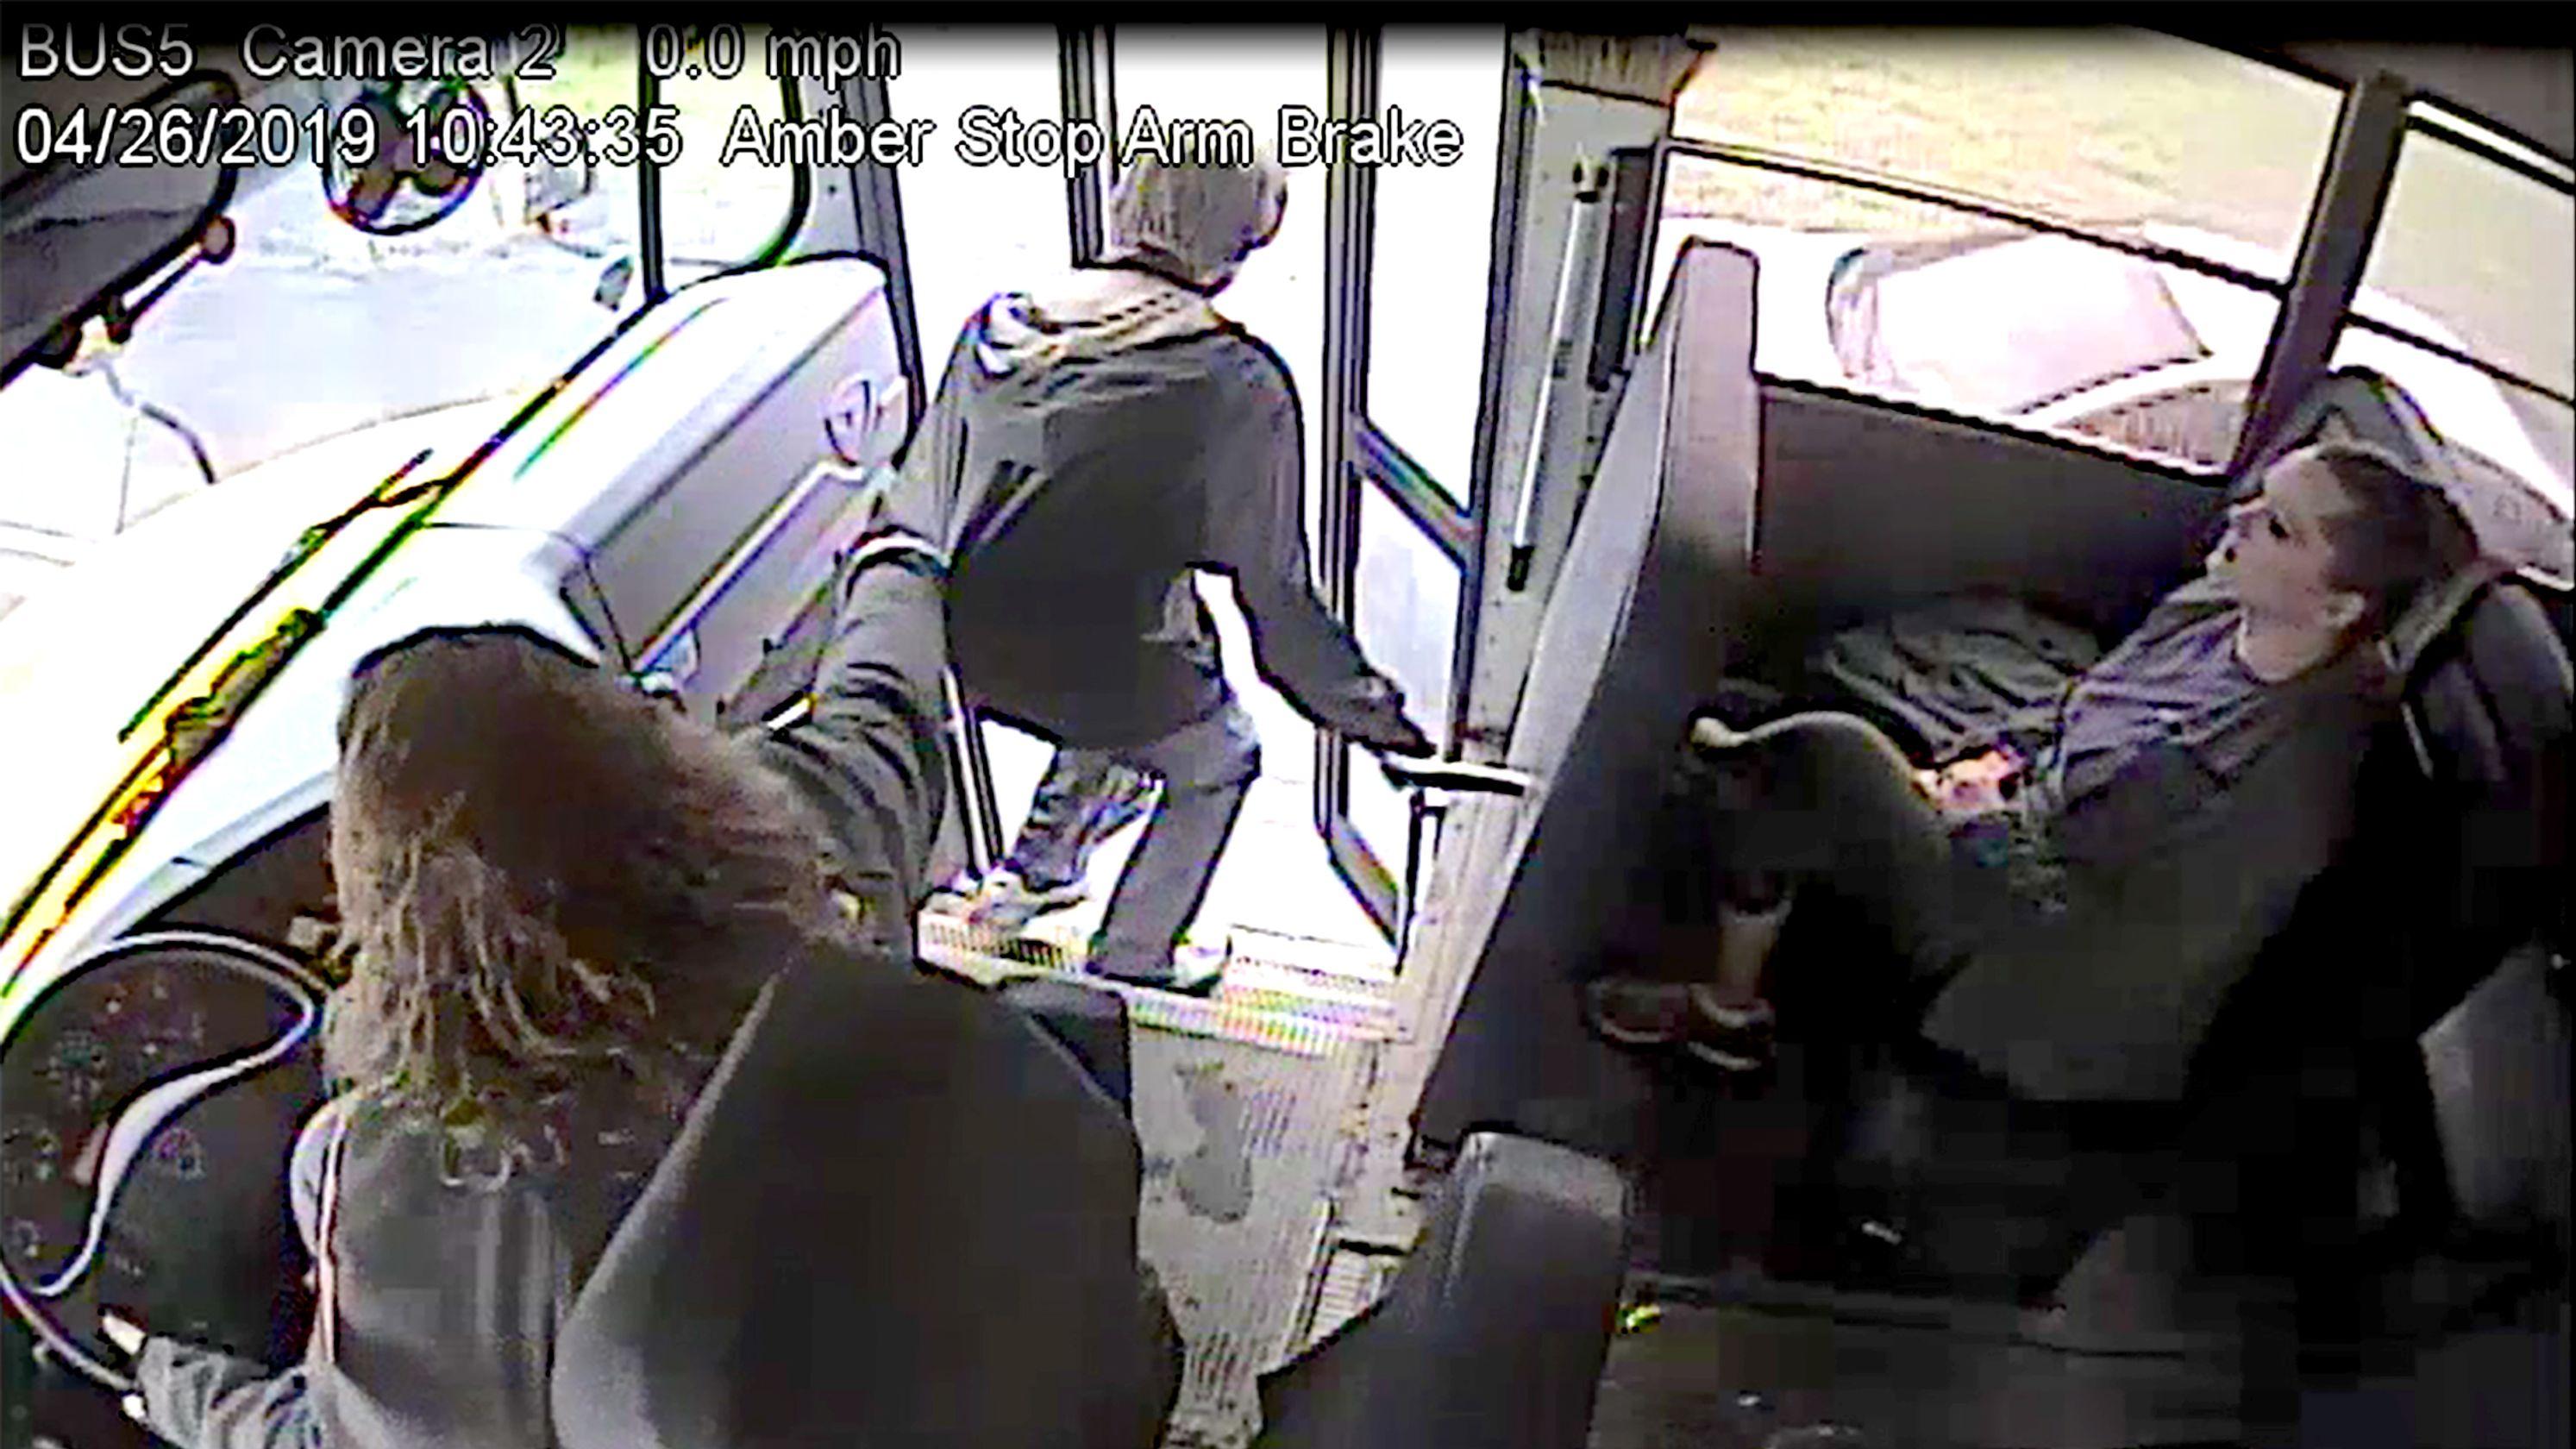 Samantha Call attrapant l'adolescent par le pull | Source : Youtube/blahblah